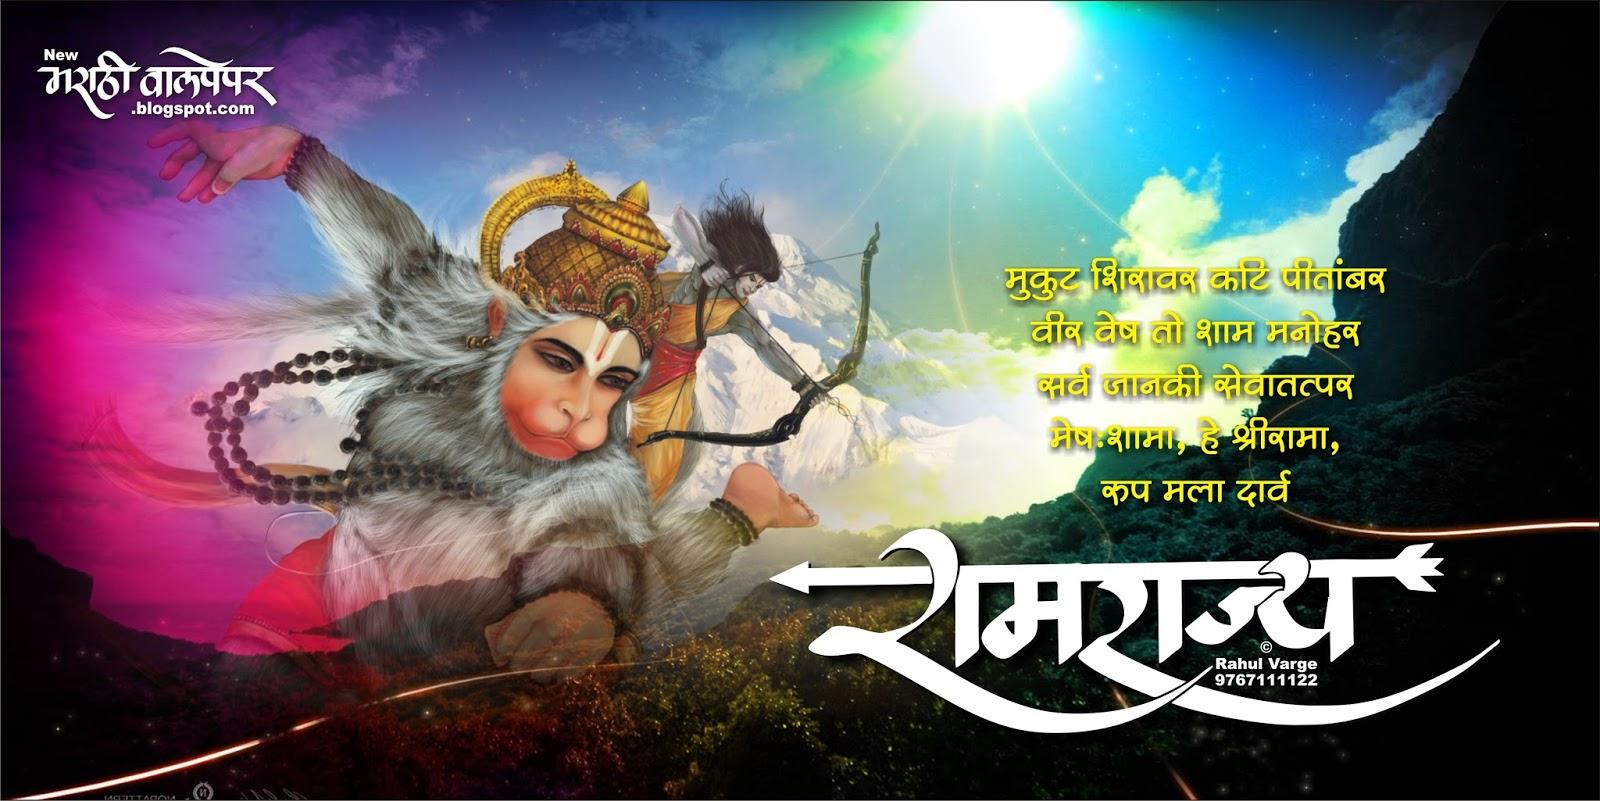 Top Wallpaper Name Rahul - 925758081s  Collection_989689.jpg